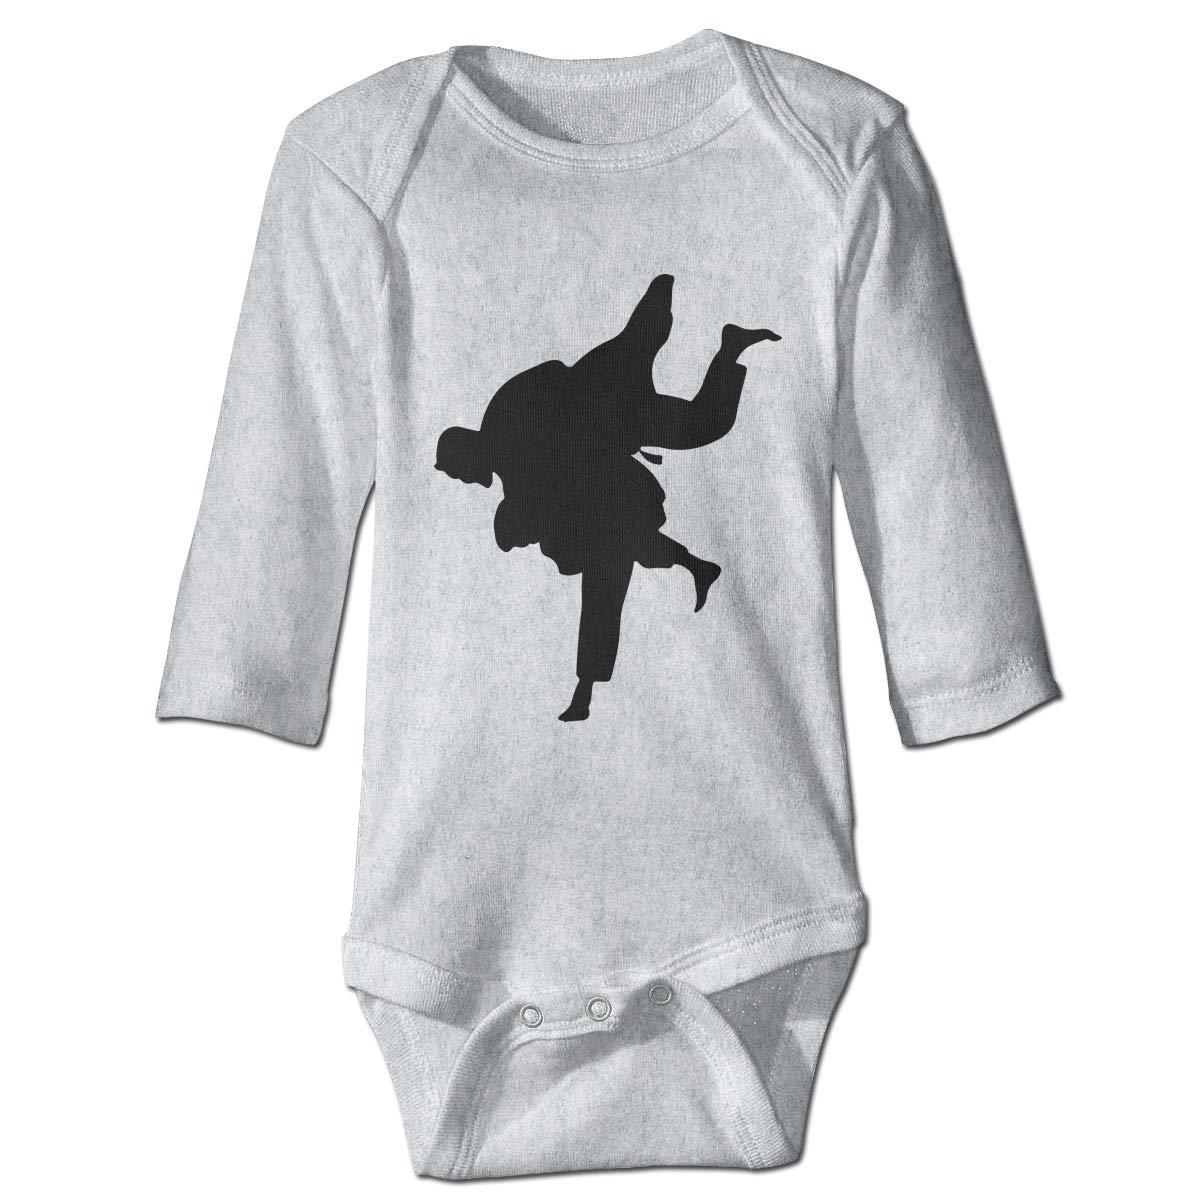 Infant Babys Long Sleeve Jumpsuit Romper Jiu Jitsu Silhouette-1 Unisex Button Playsuit Outfit Clothes